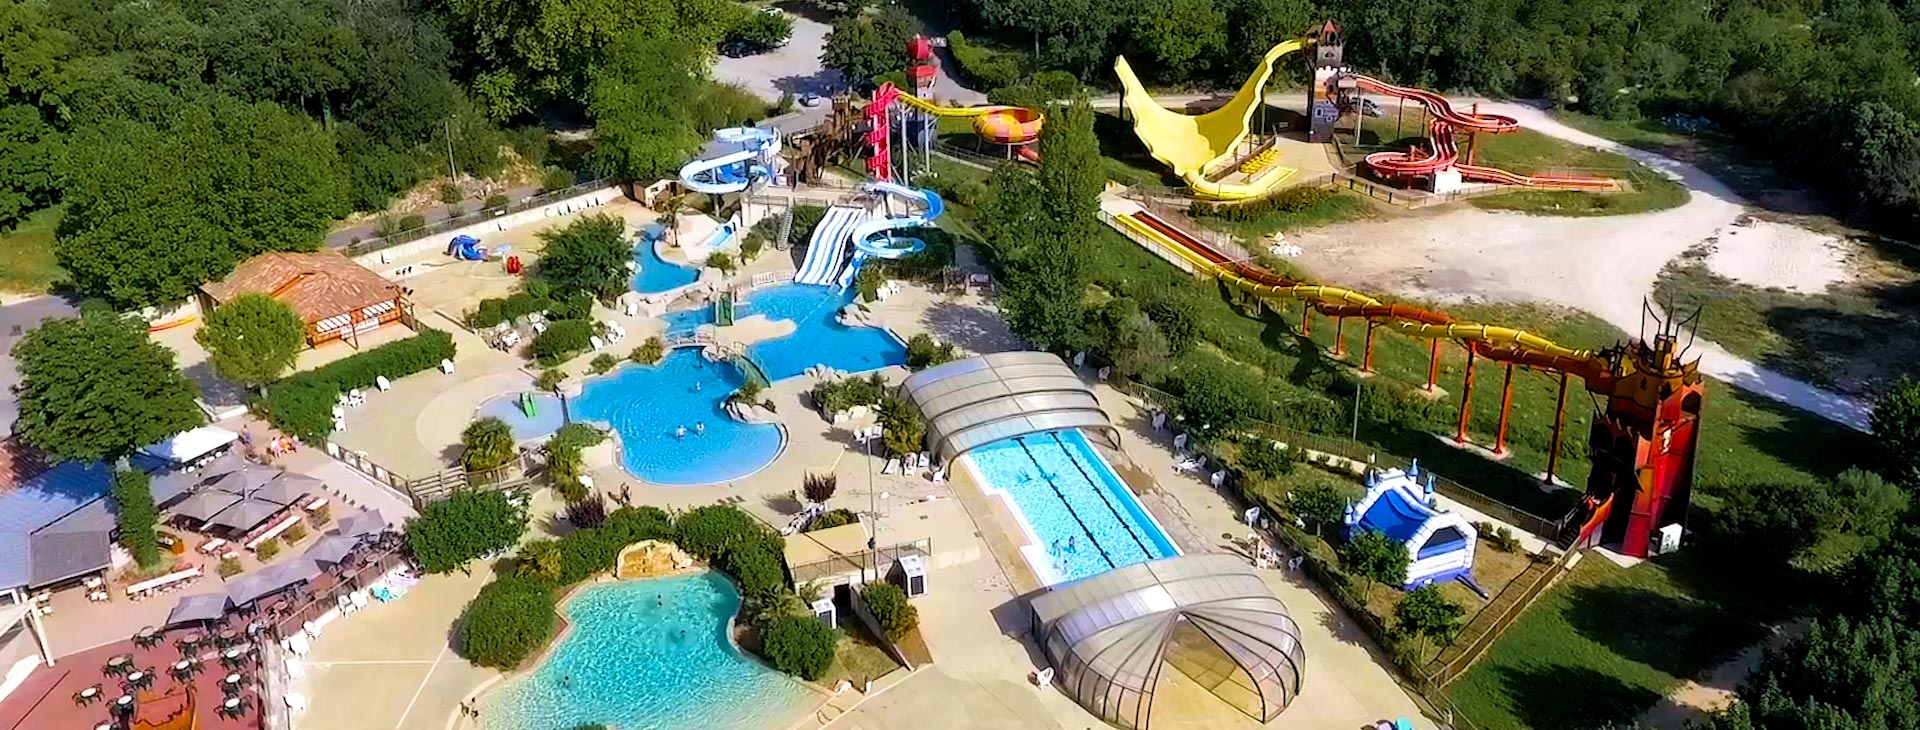 Campings Et Résidences Capfun : Camping Location Mobil Home ... dedans Camping Ardèche Avec Piscine